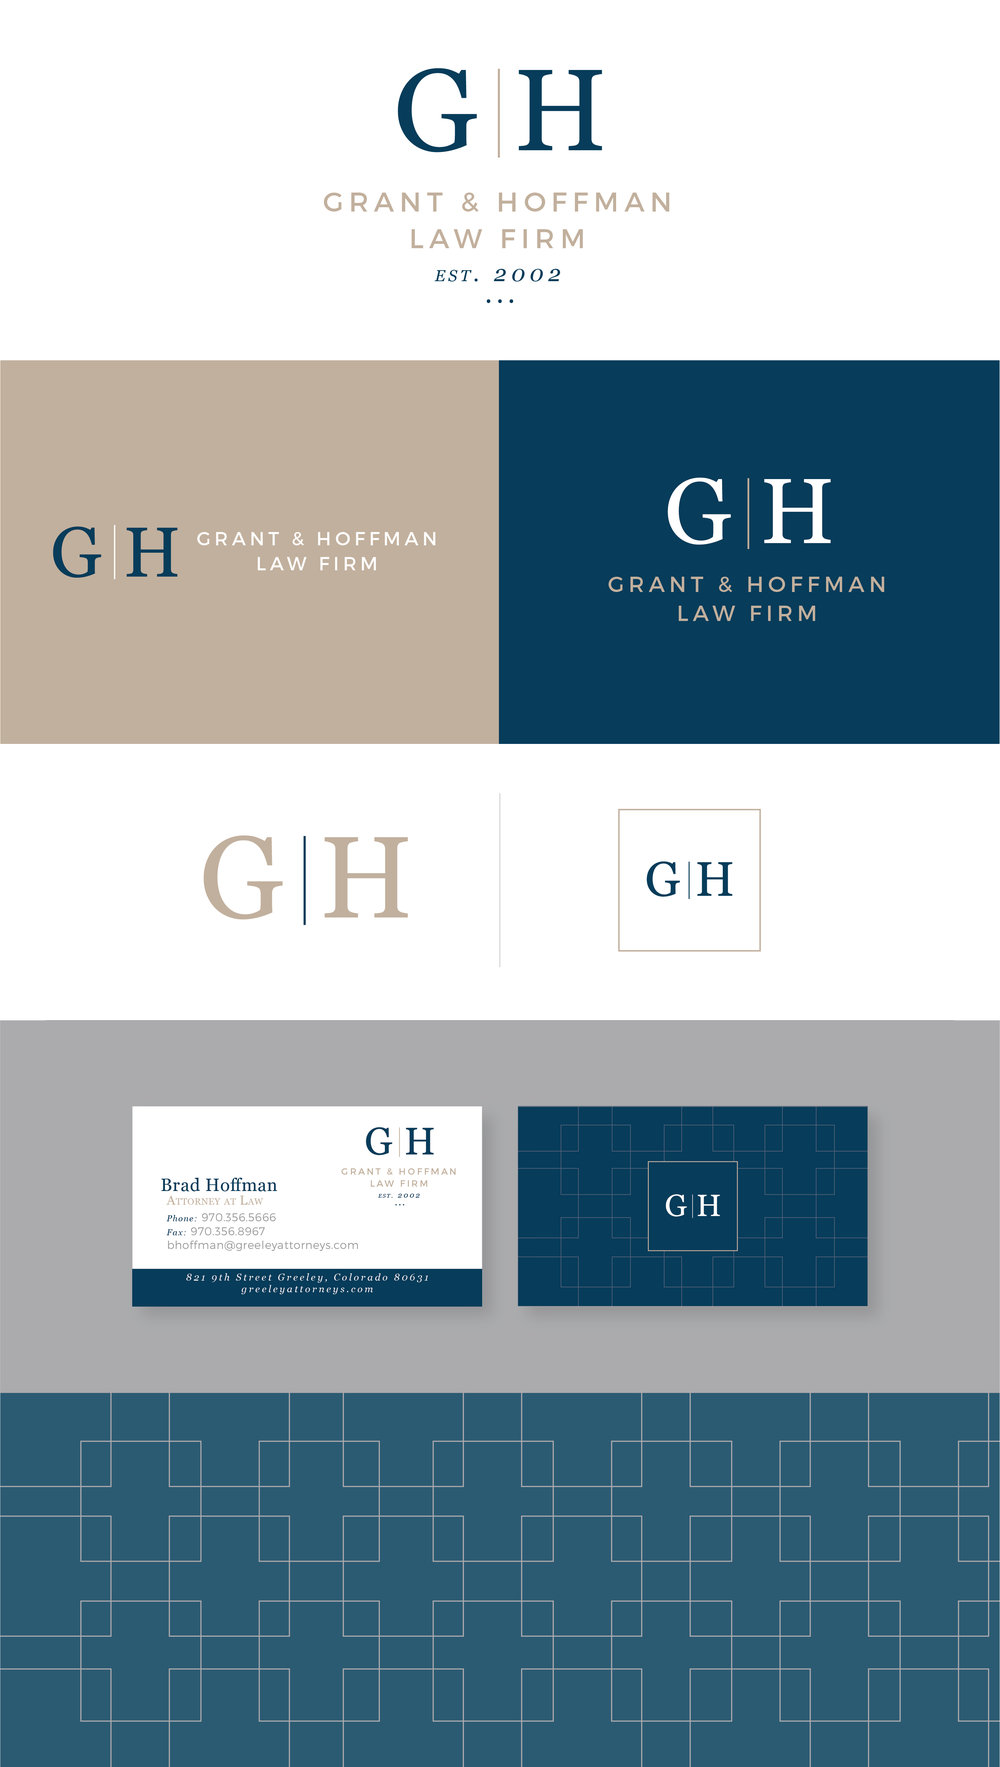 G&H_FirstLook-03.jpg